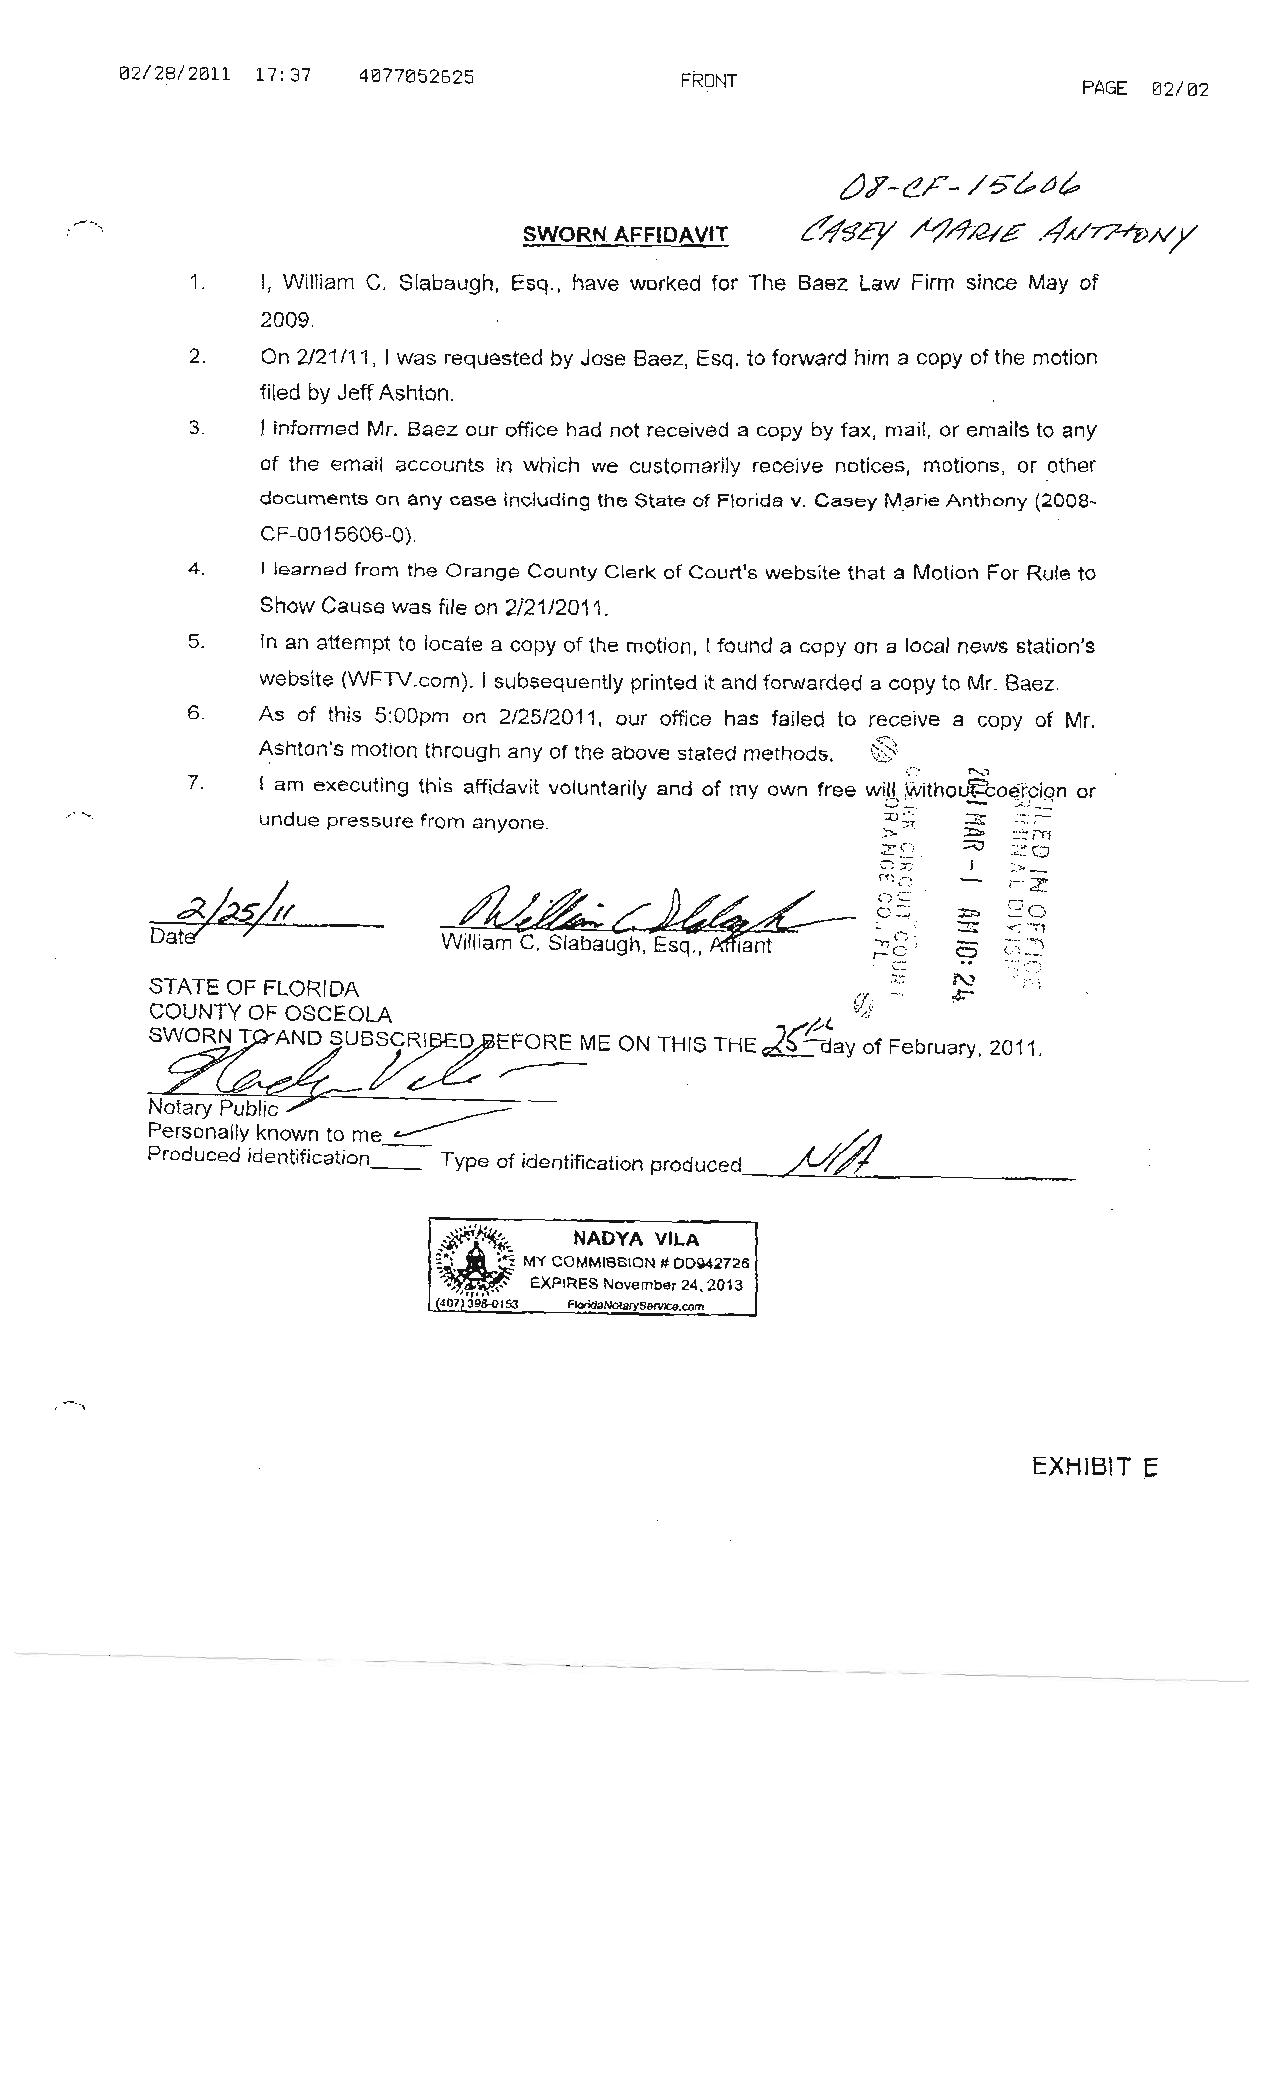 affidavit of non relationship philippines embassy